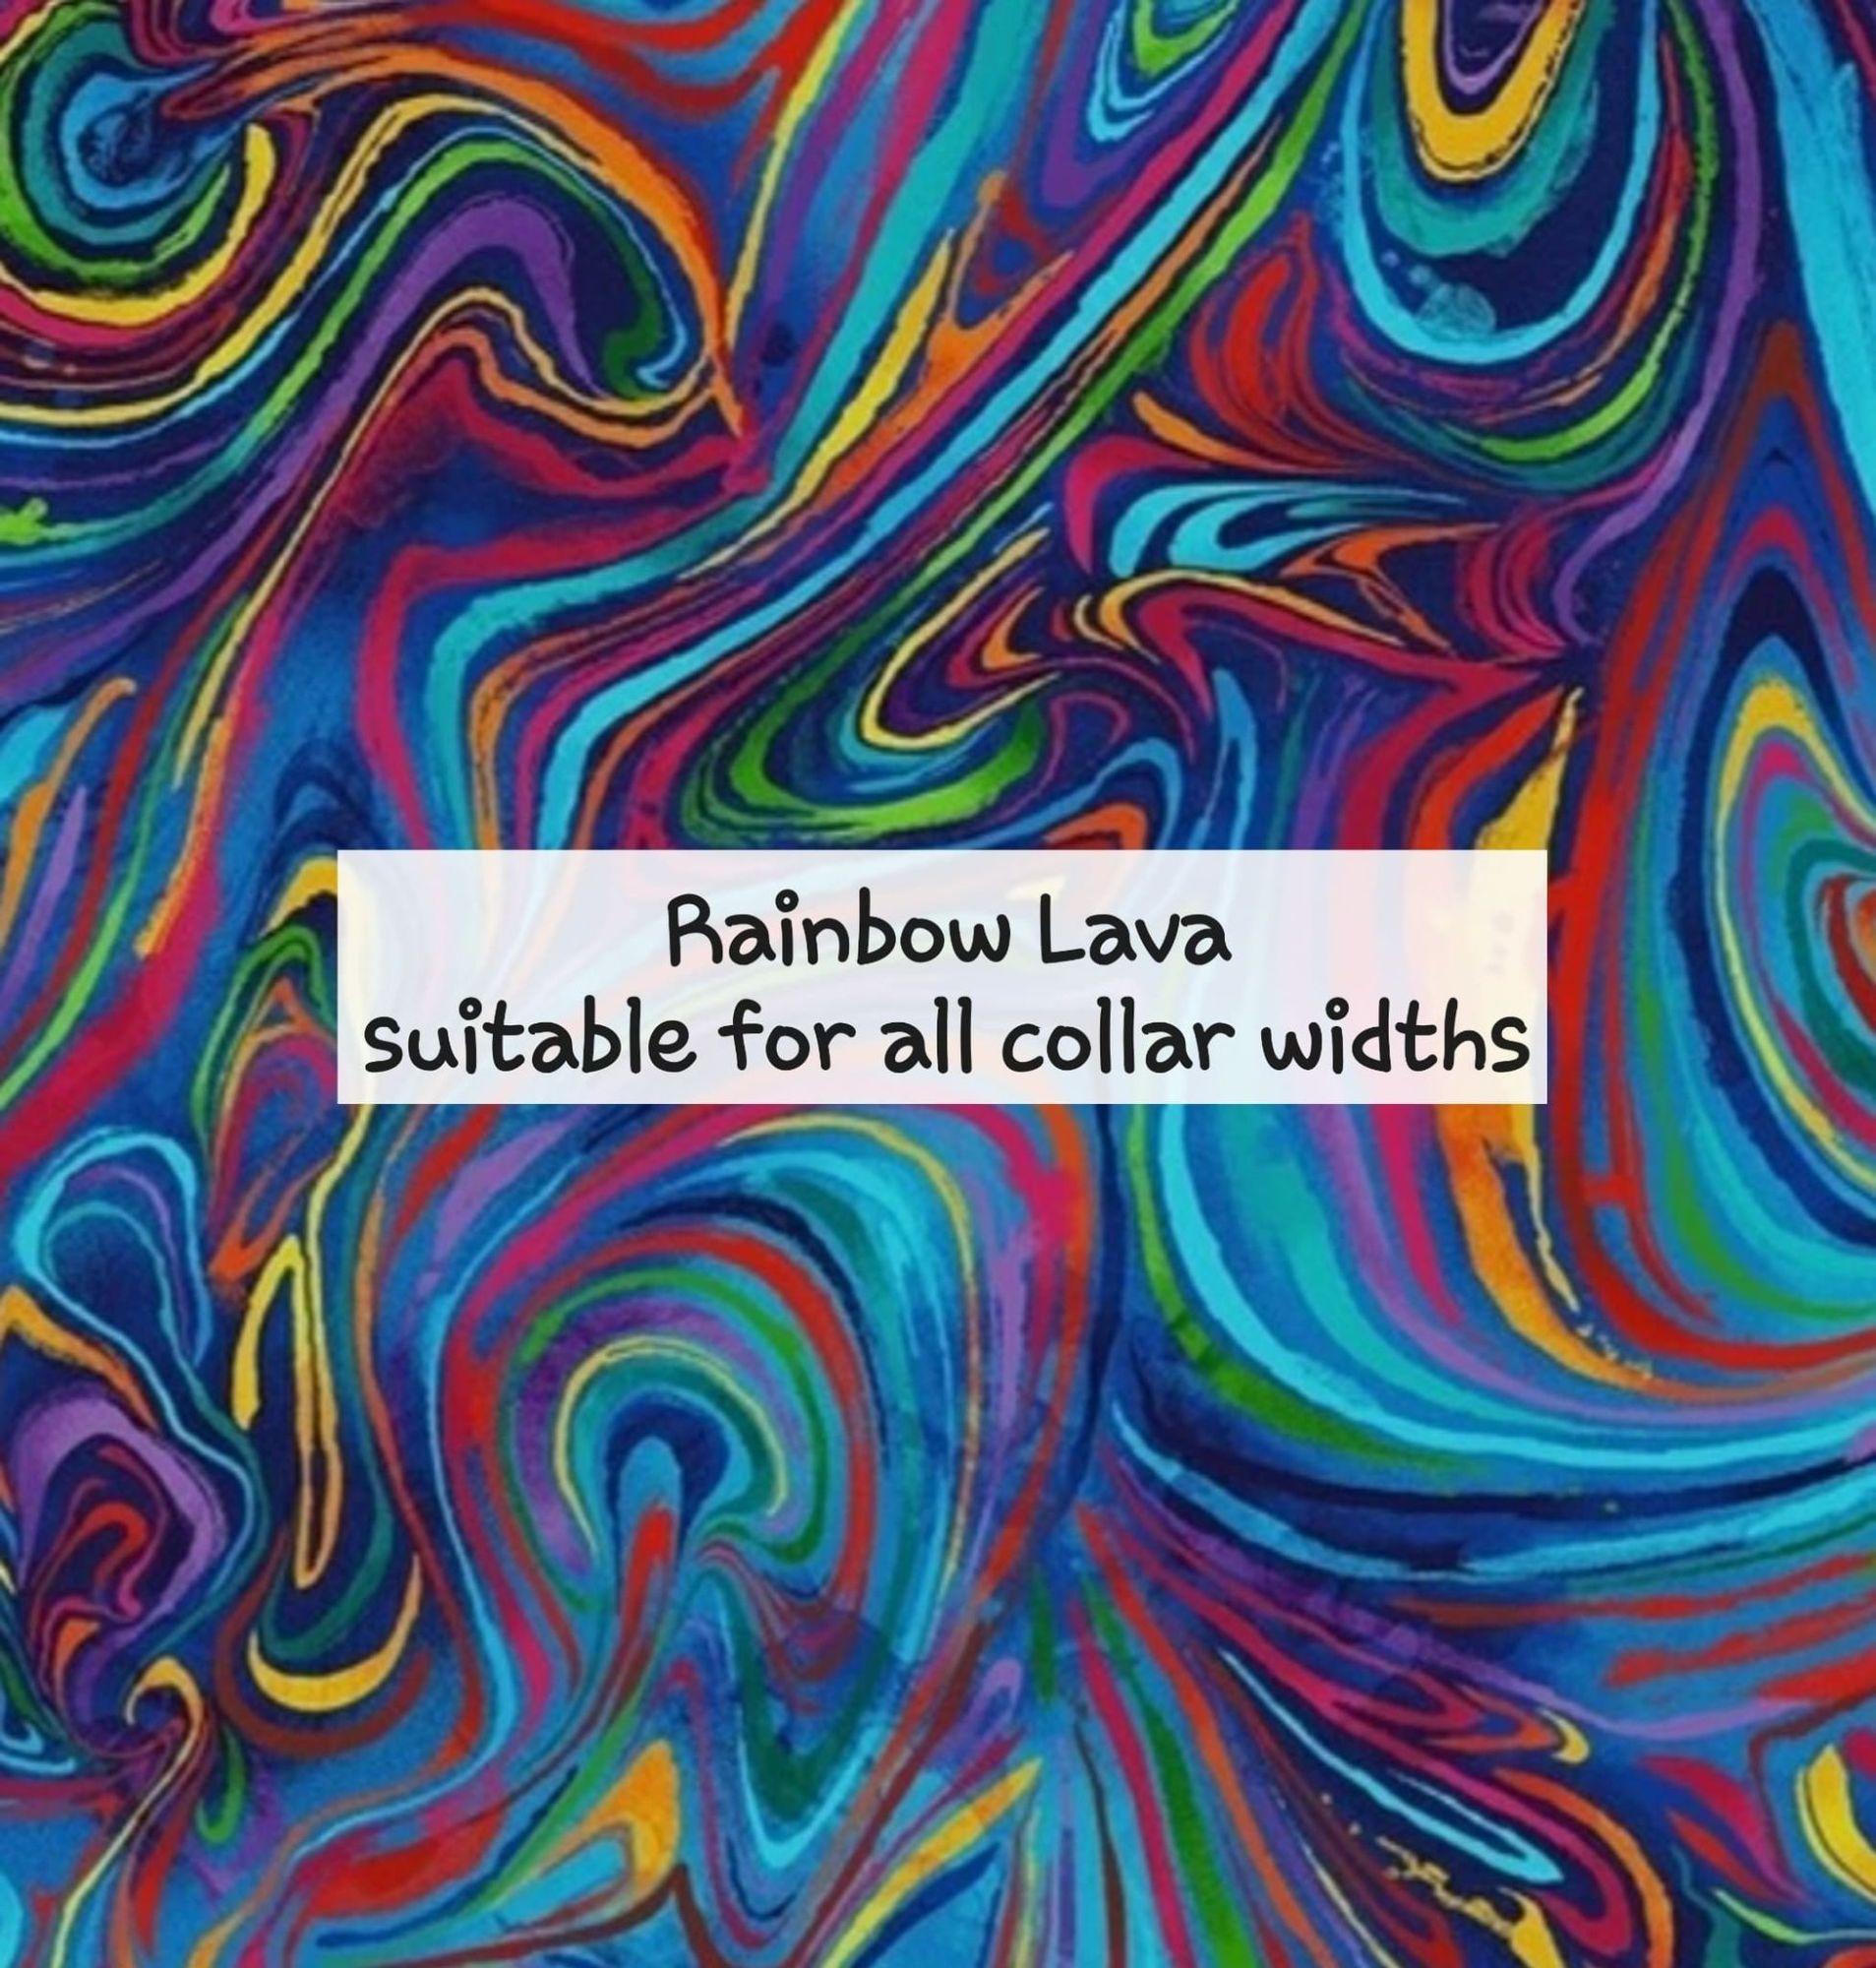 Rainbow Lava